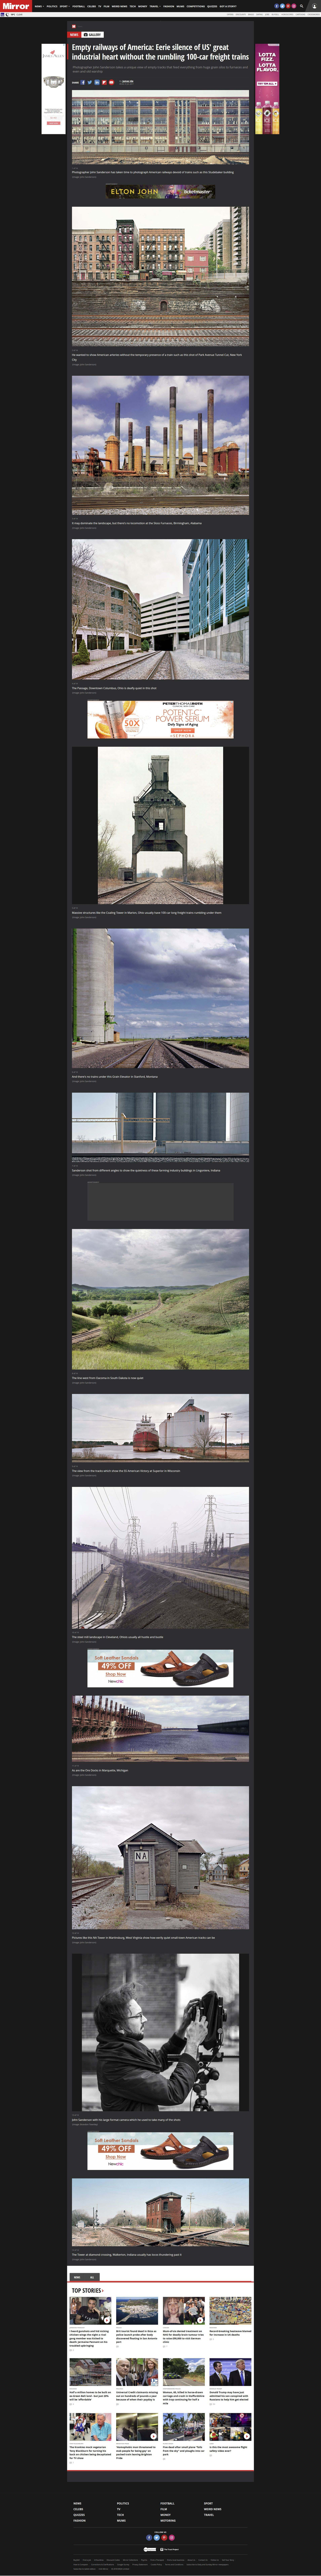 07-31-2017_Railways of America_Mirror UK.jpg